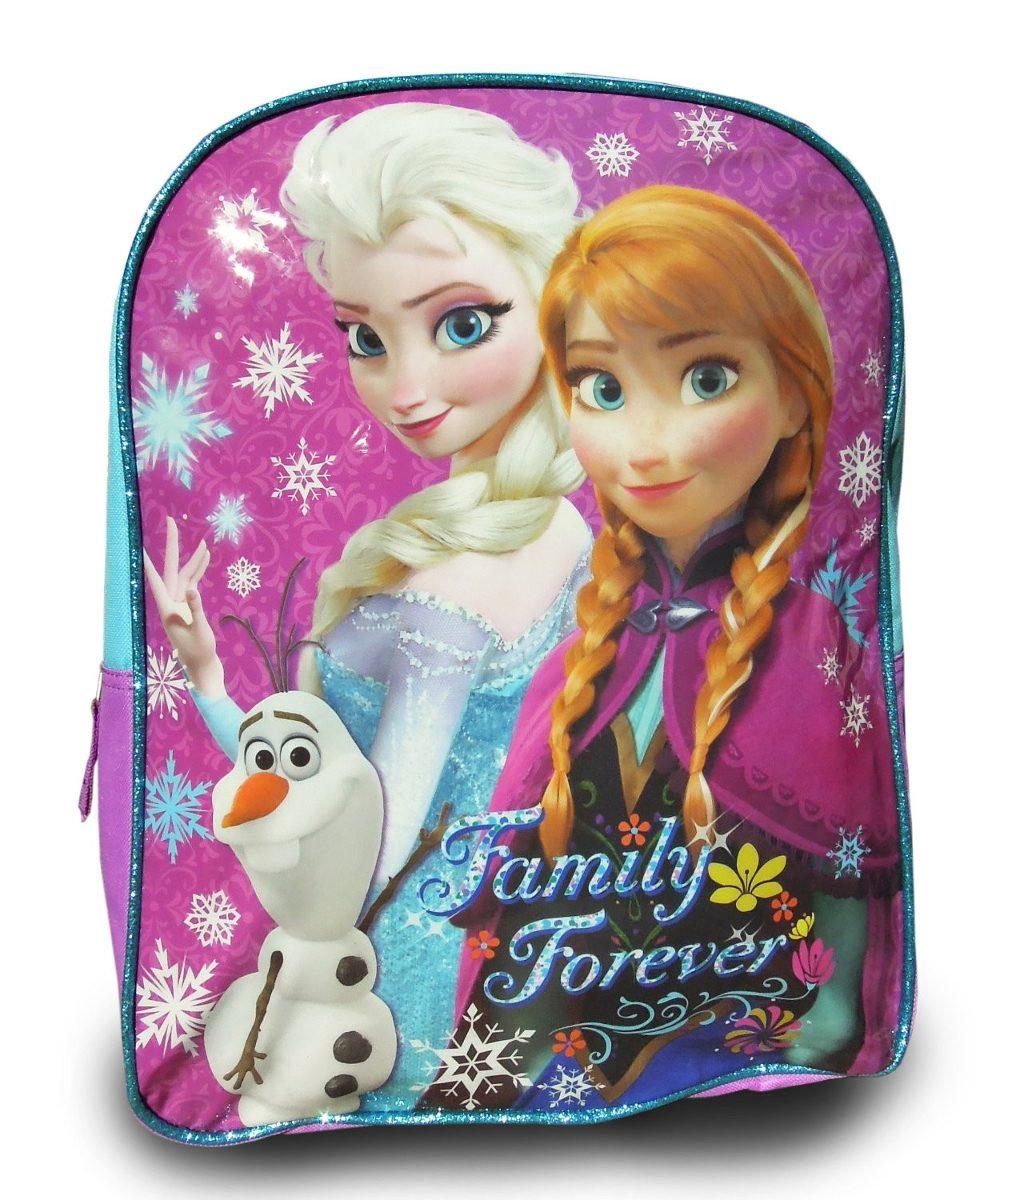 Ana Morral Niñas Familia Maletín Frozen Bolso Elsa n0wPOk